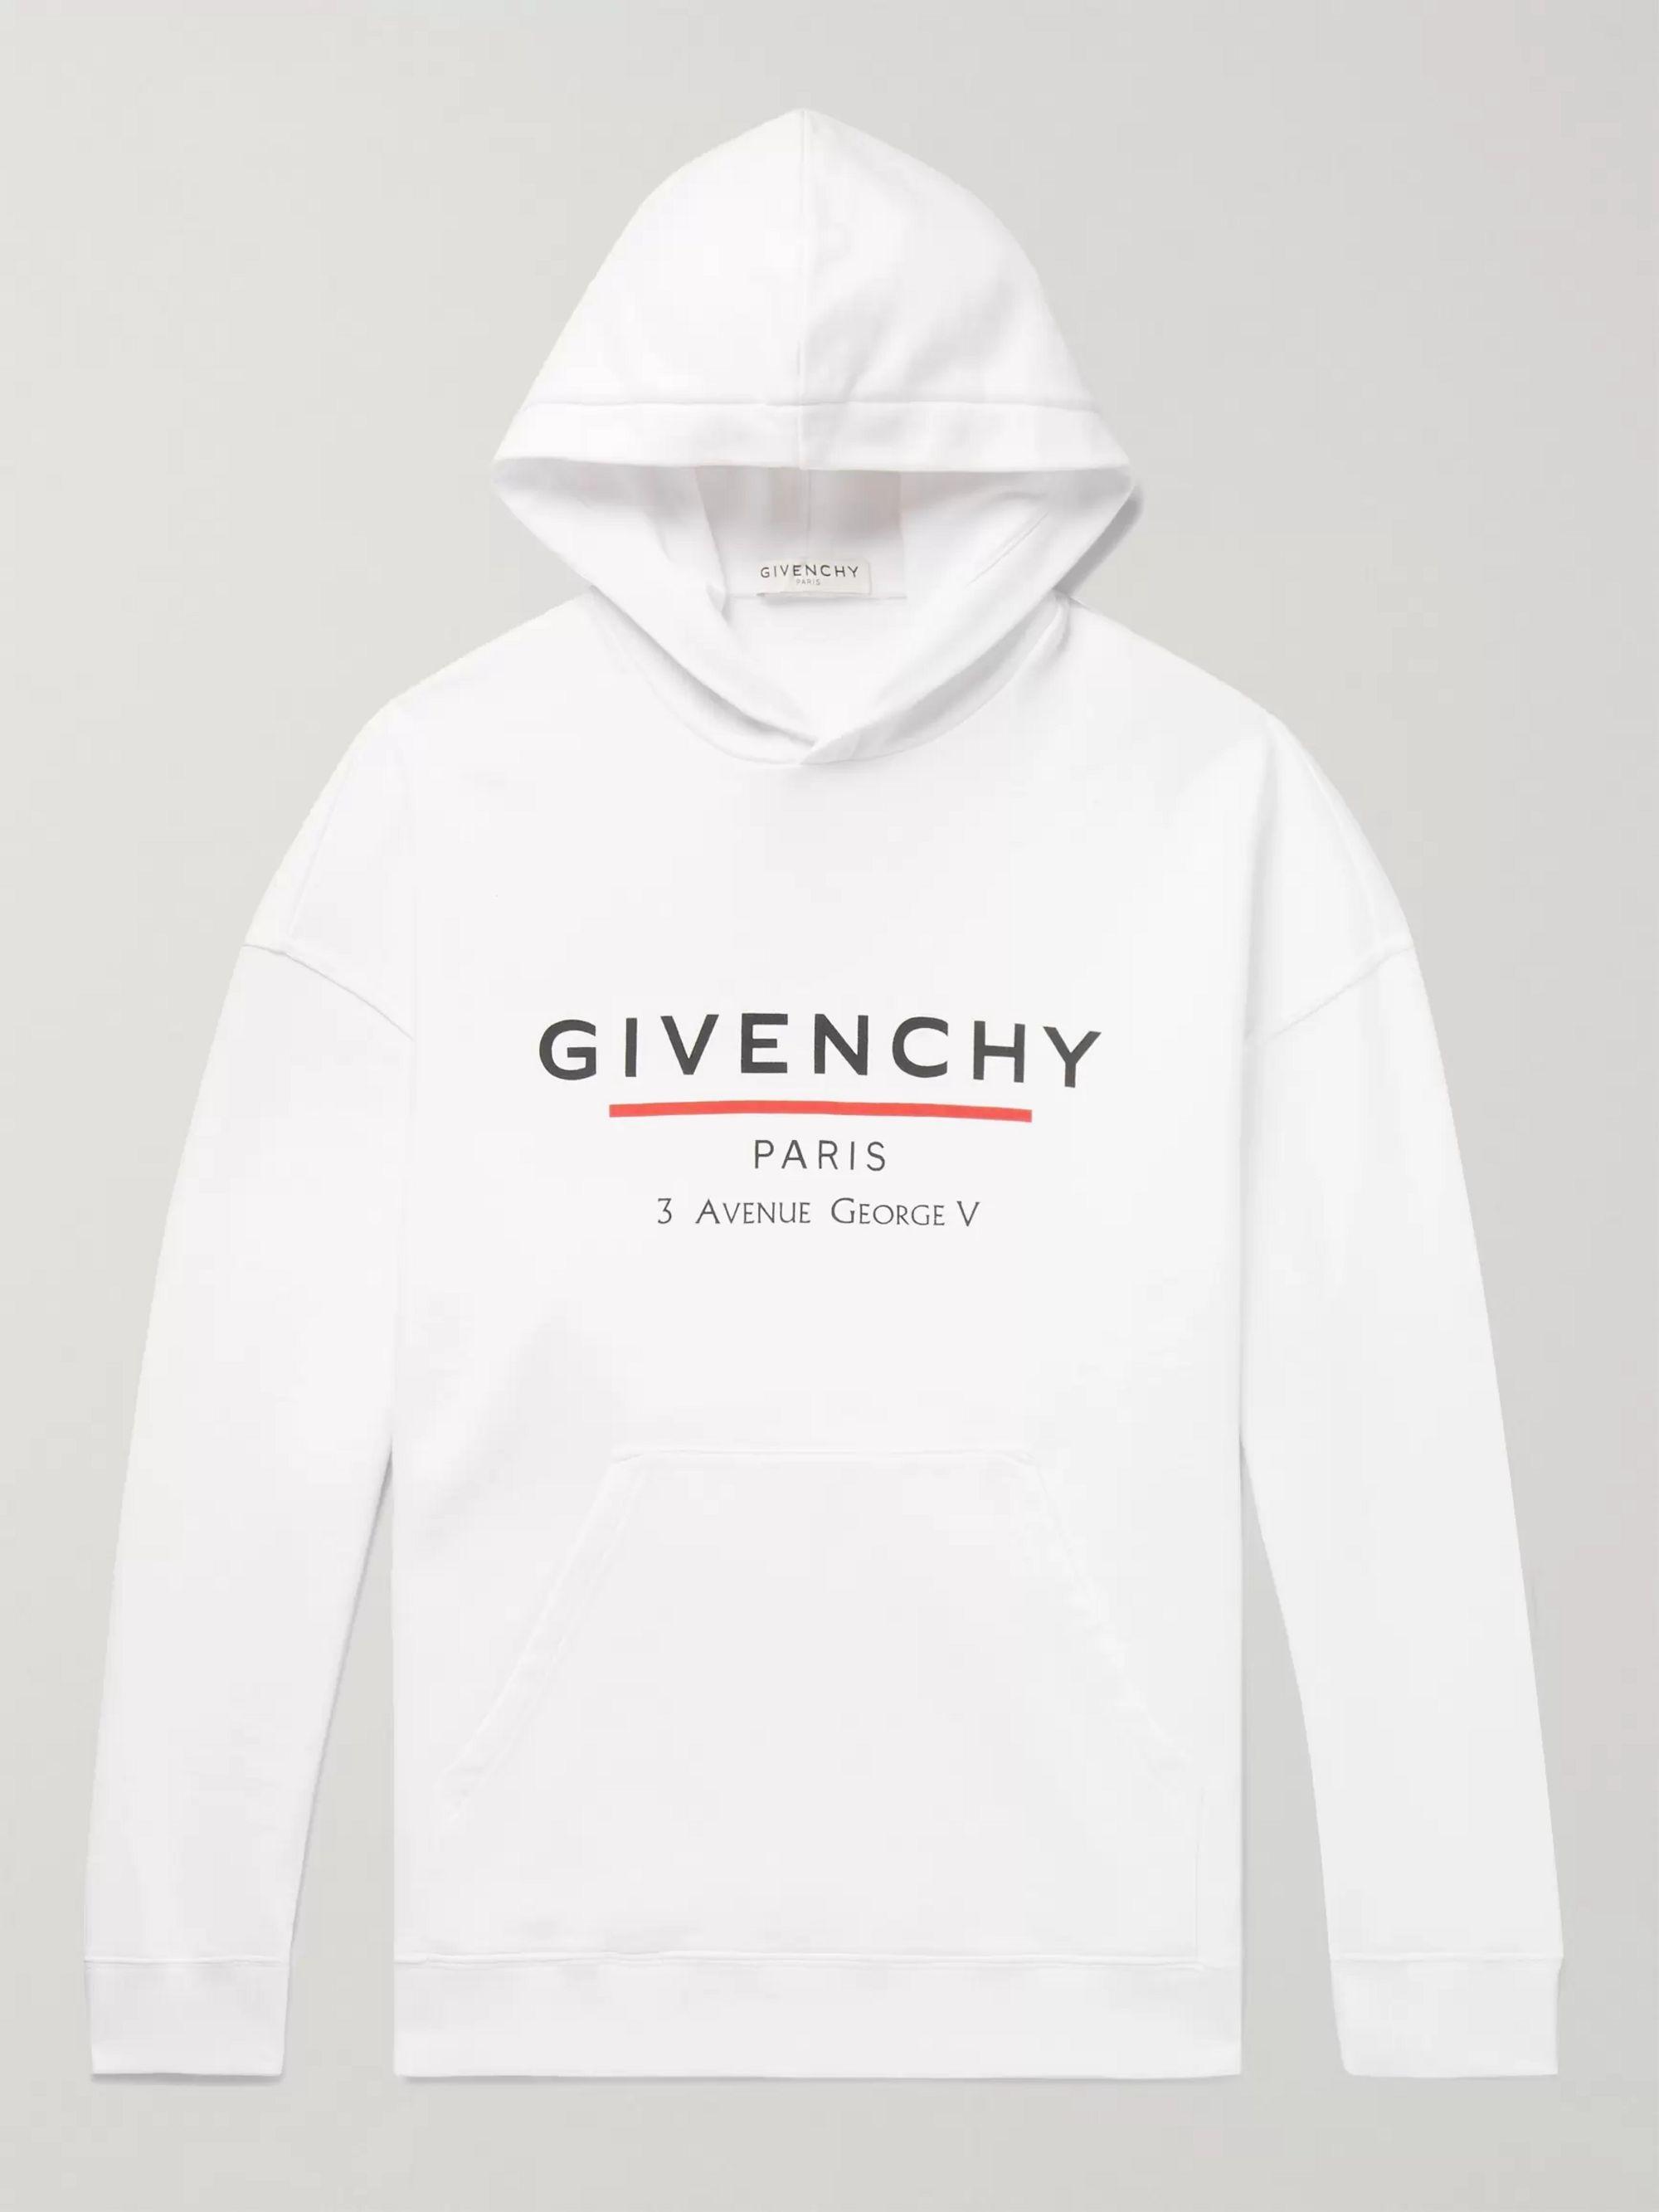 Givenchy Paris in Herren Kapuzenpullover & Sweats günstig